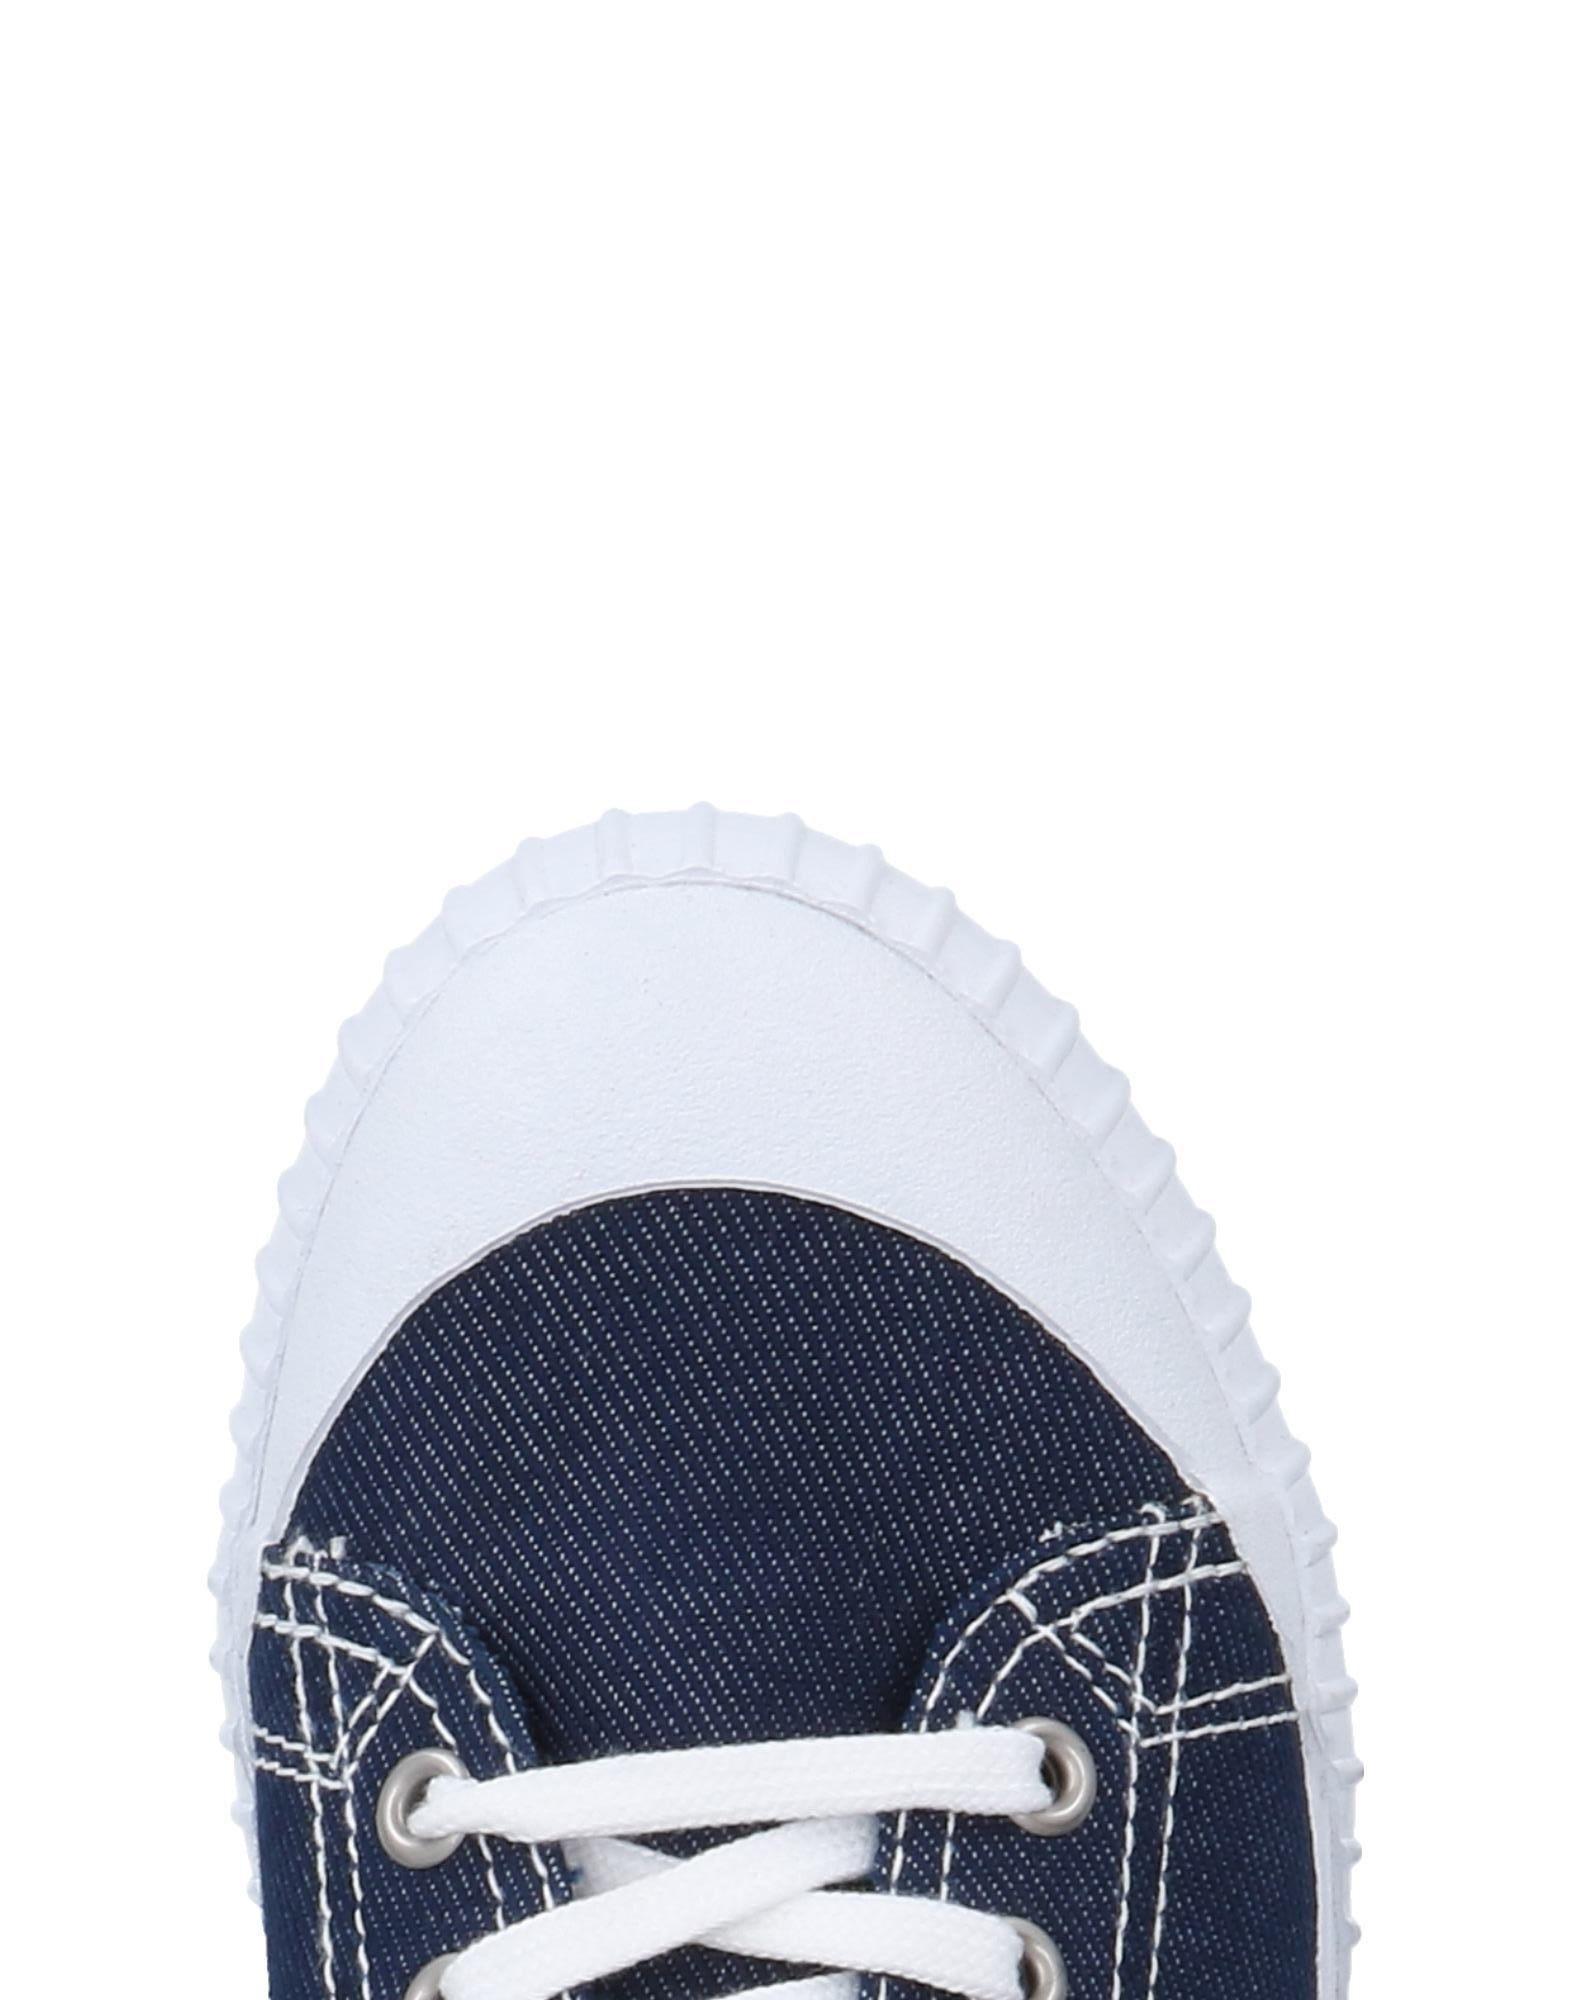 Cult Sneakers Damen Qualität  11498341HV Gute Qualität Damen beliebte Schuhe c2bae3